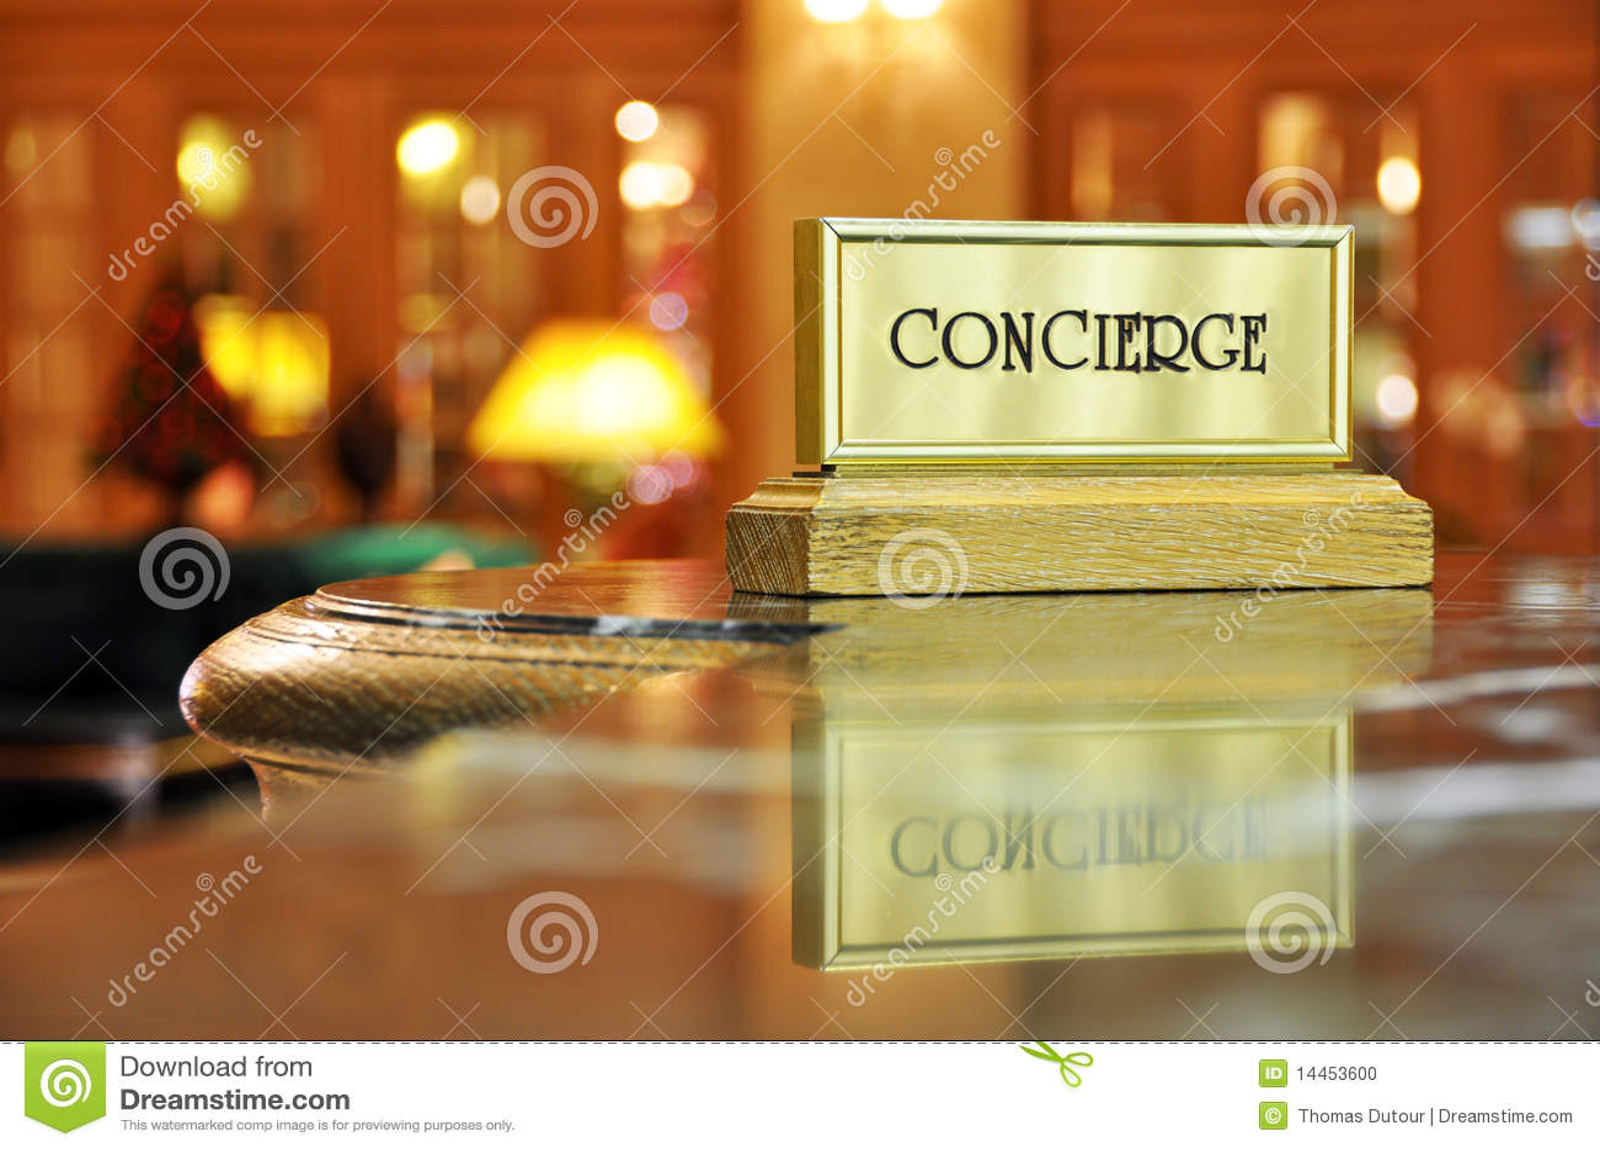 Concierge γραφείο